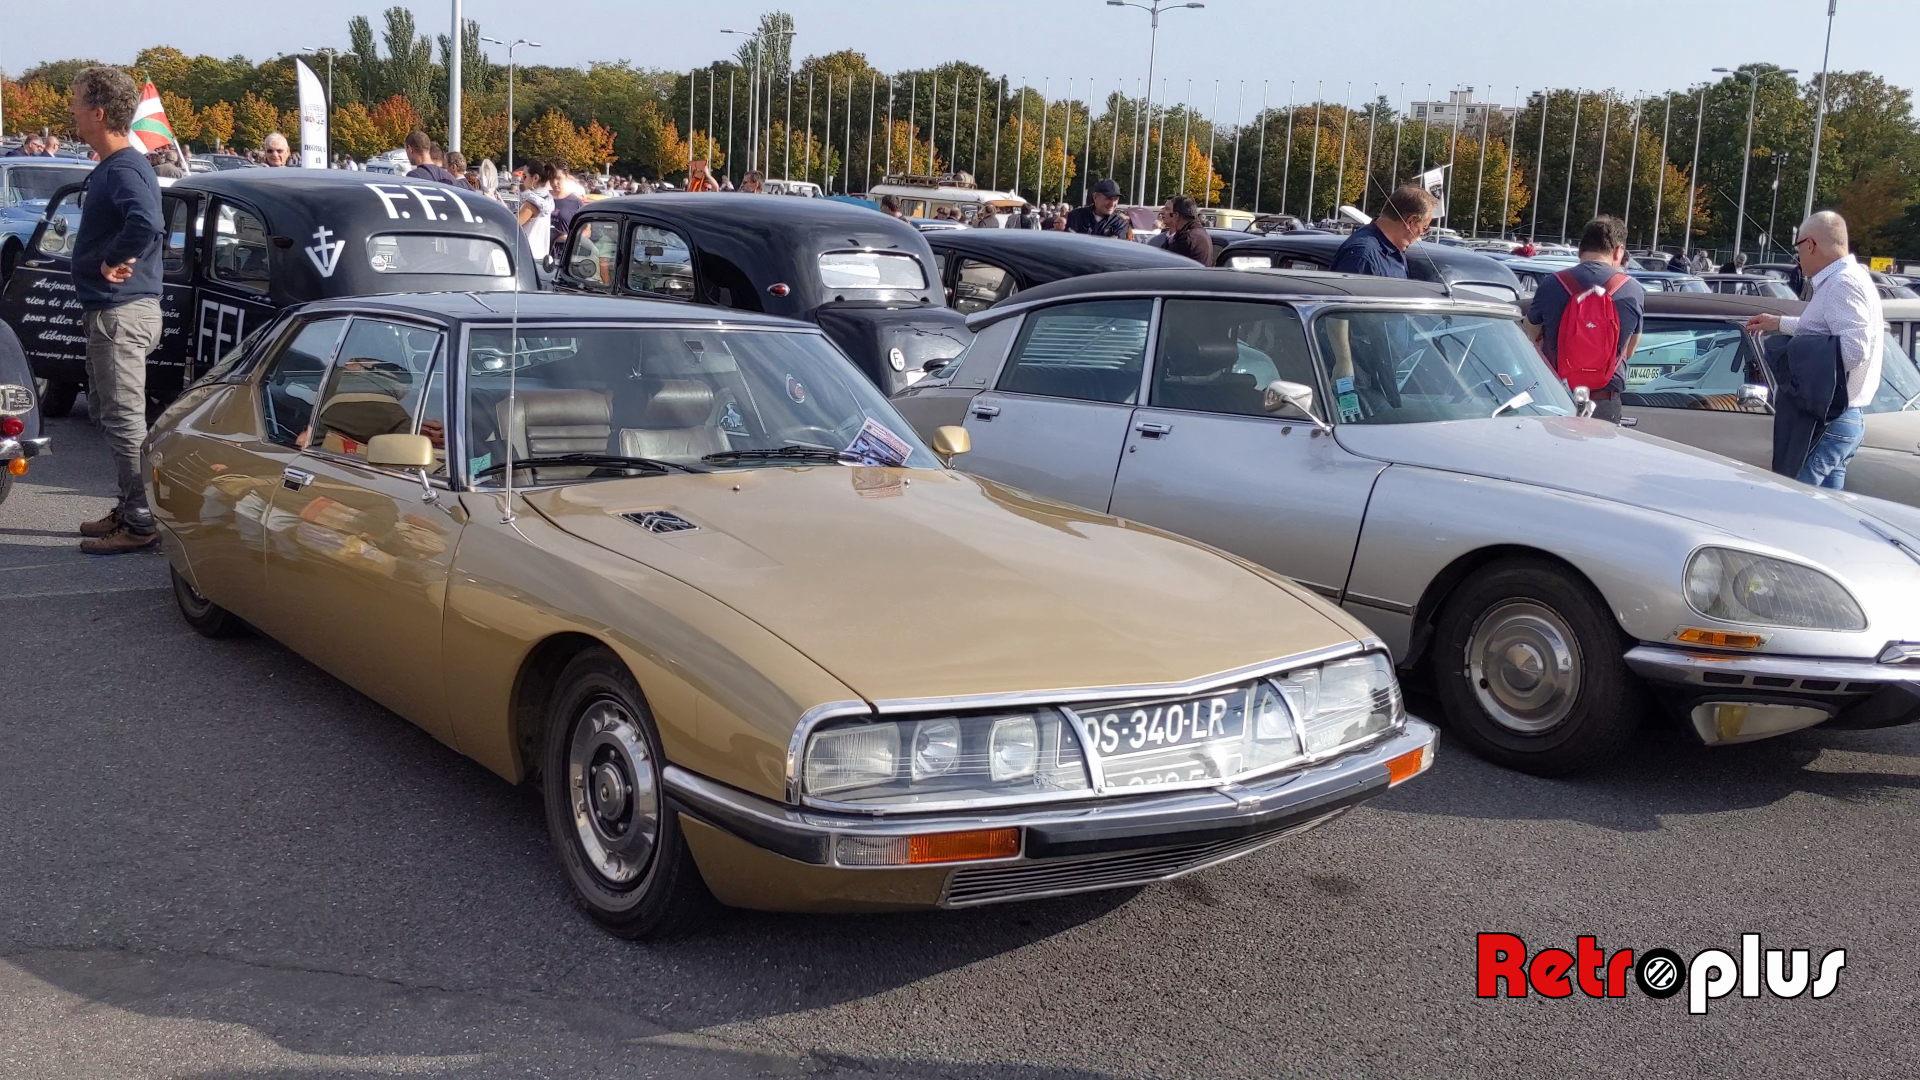 Automedon2019-parkingCitroen25